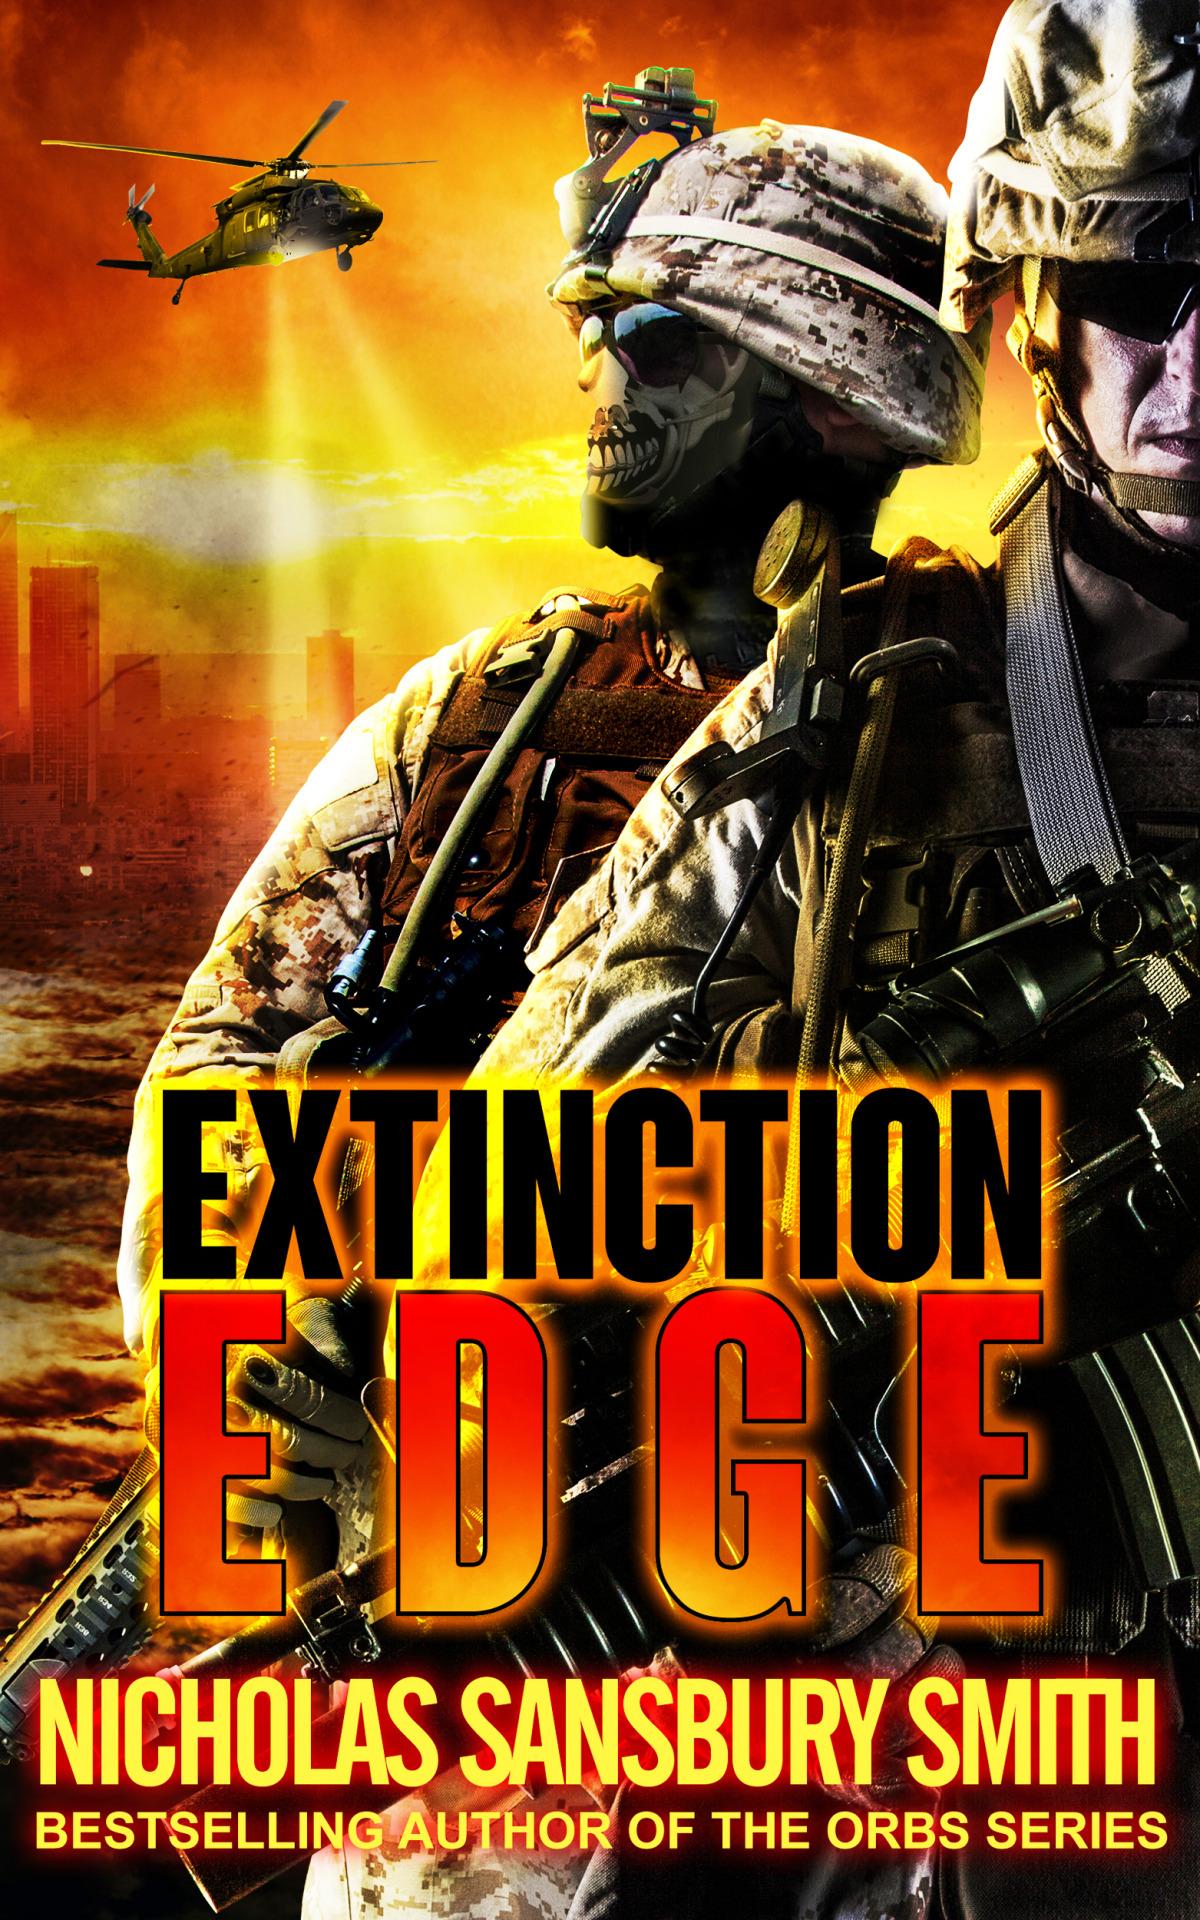 ExtinctionEdge